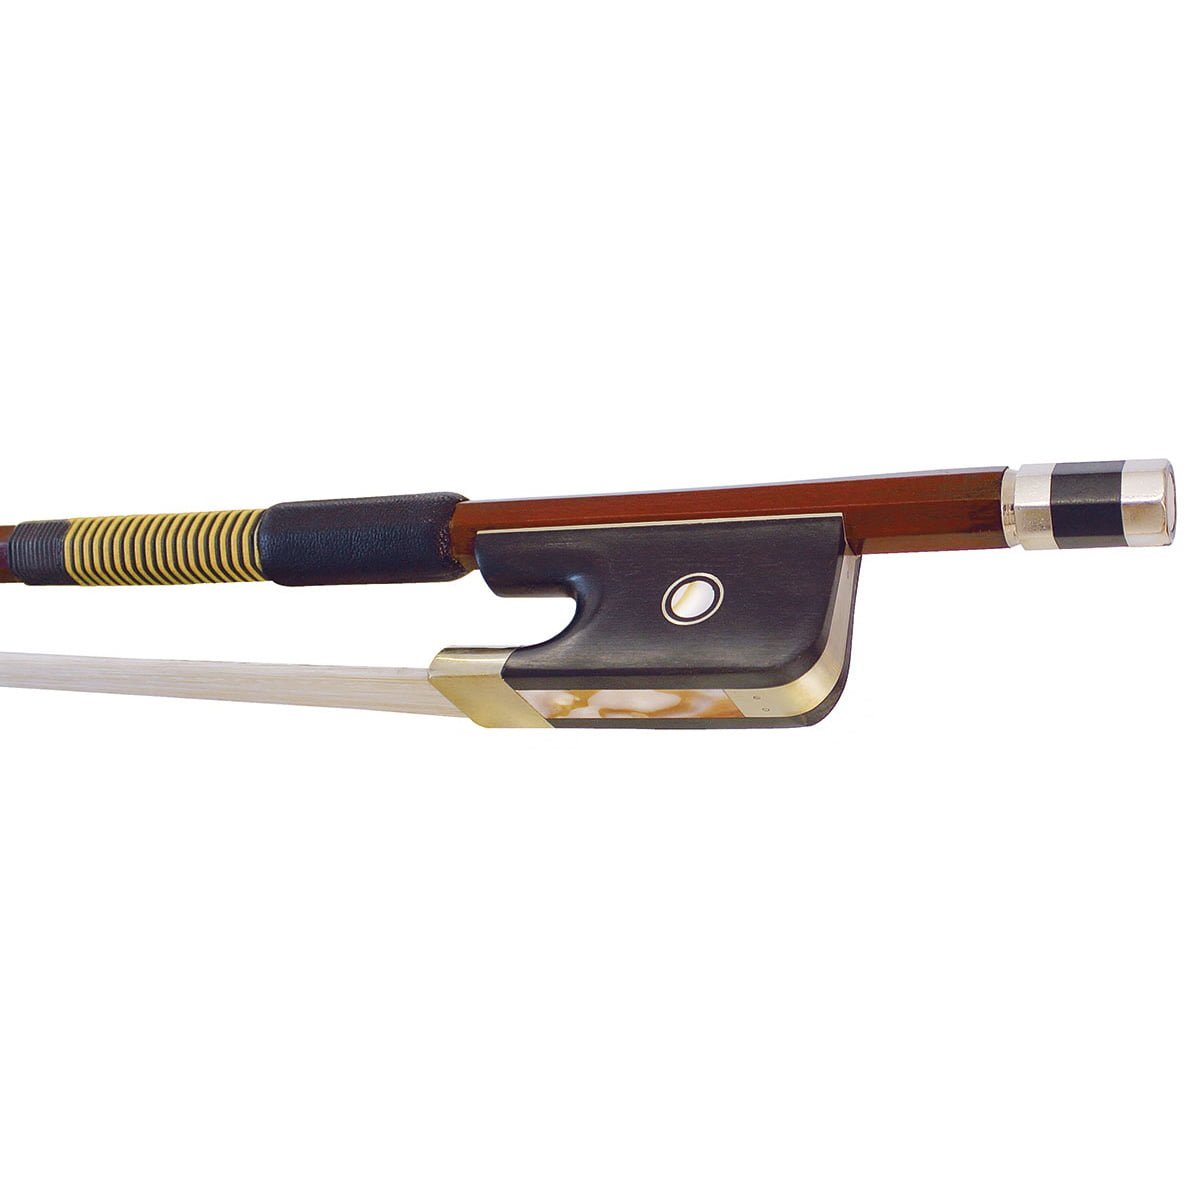 Hidersine Double Bass Bow 1:8 - 3:4 size Brazilwood Octagonal